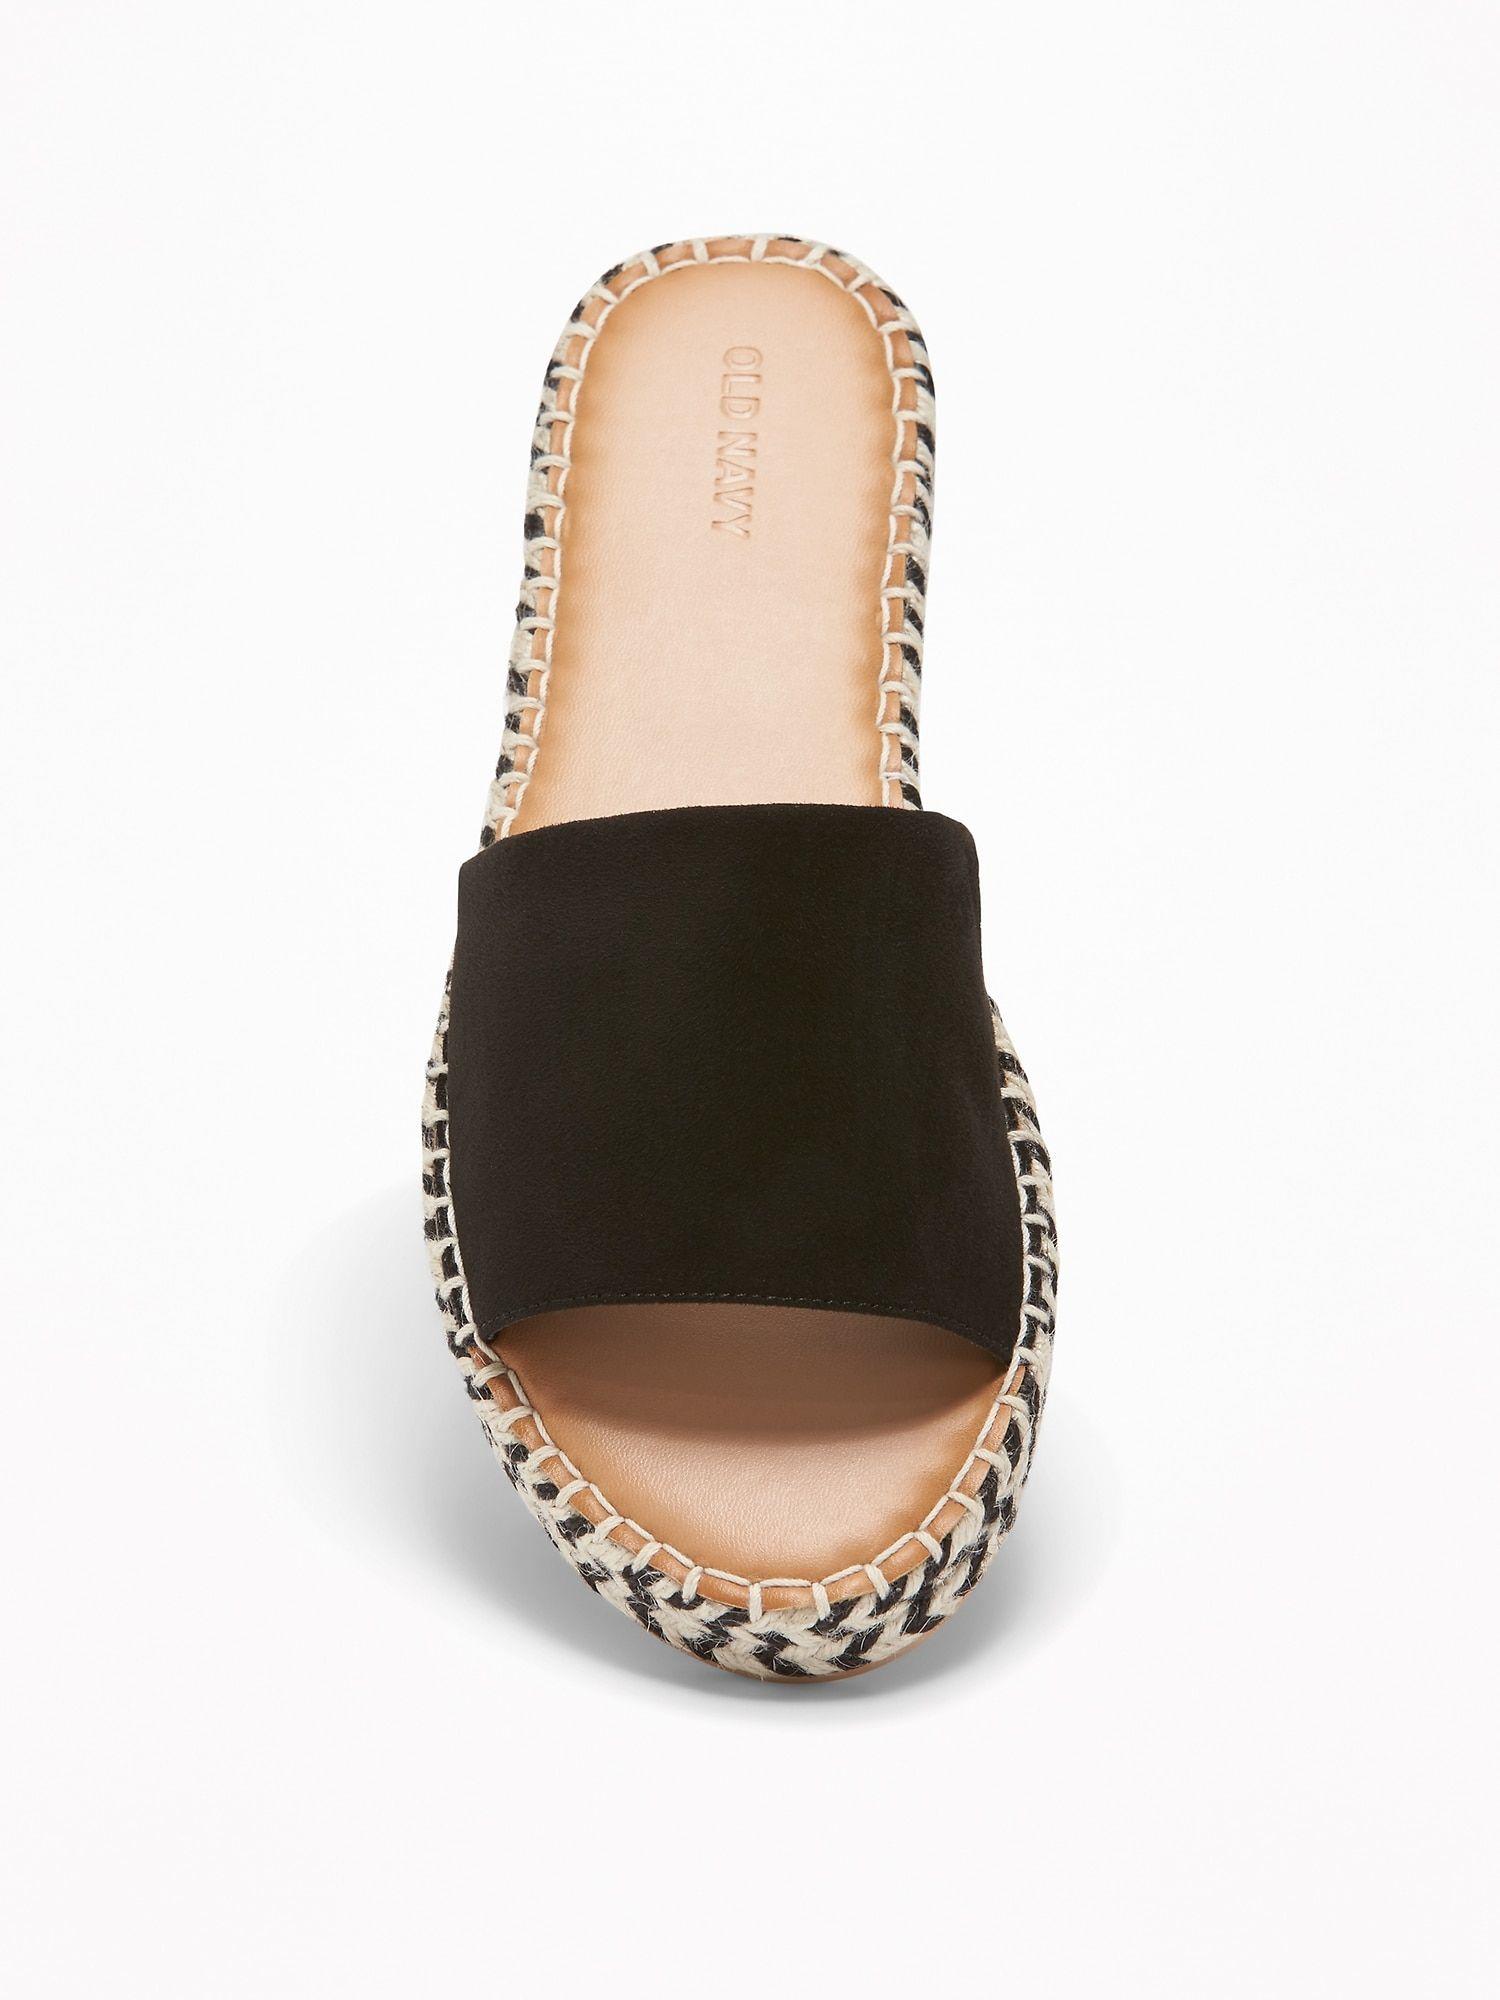 FauxSuede Slide Espadrille Sandals for Women Old Navy